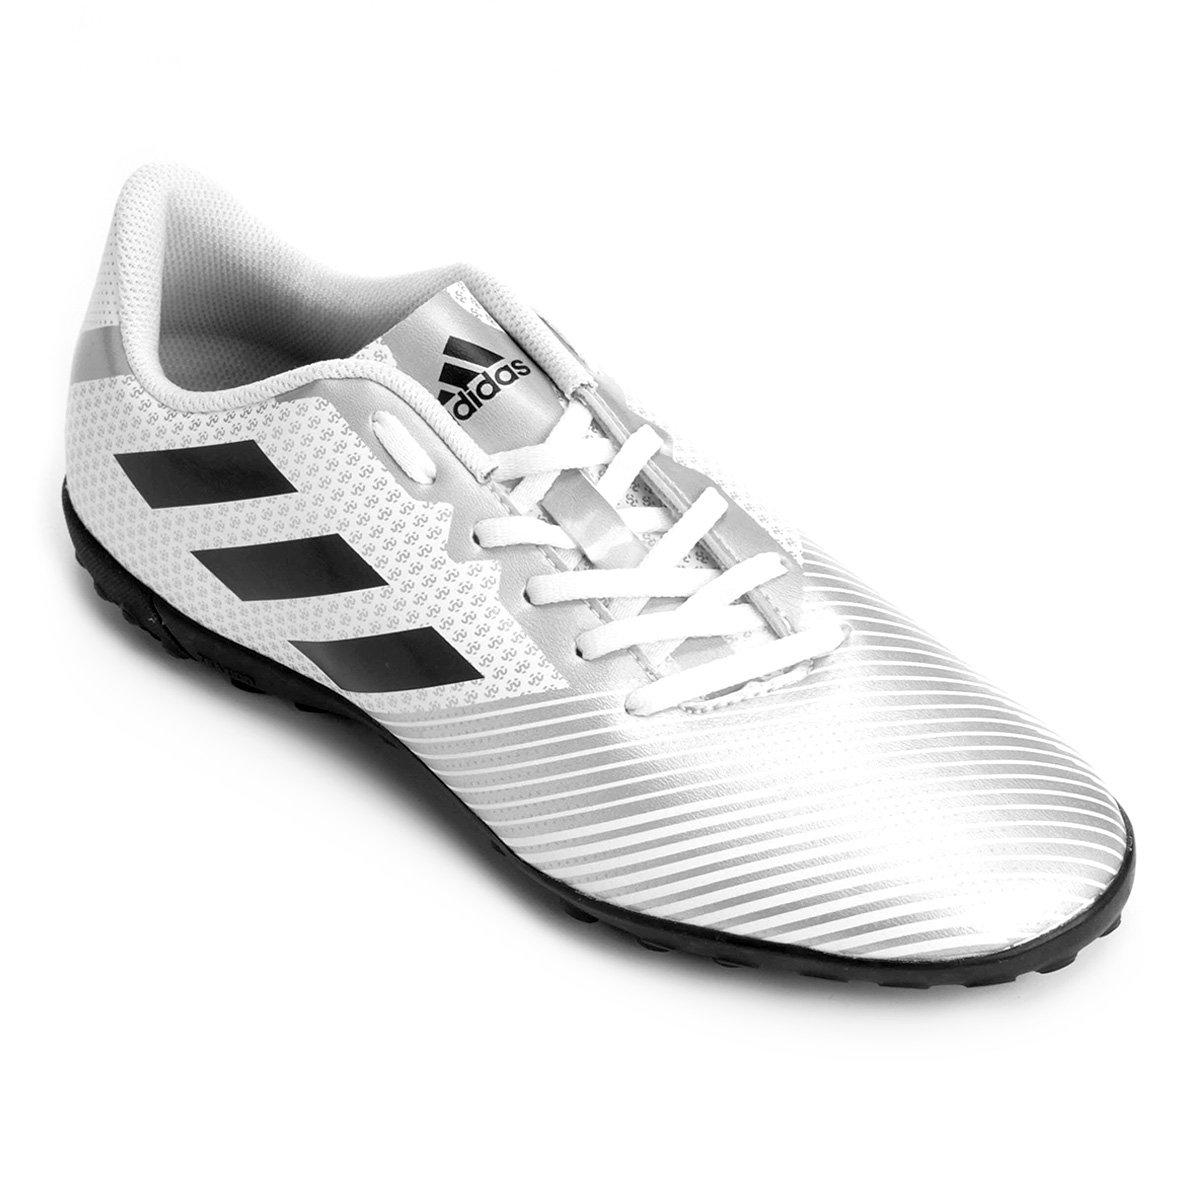 1b382b395d Chuteira Society Adidas Artilheira 17 TF